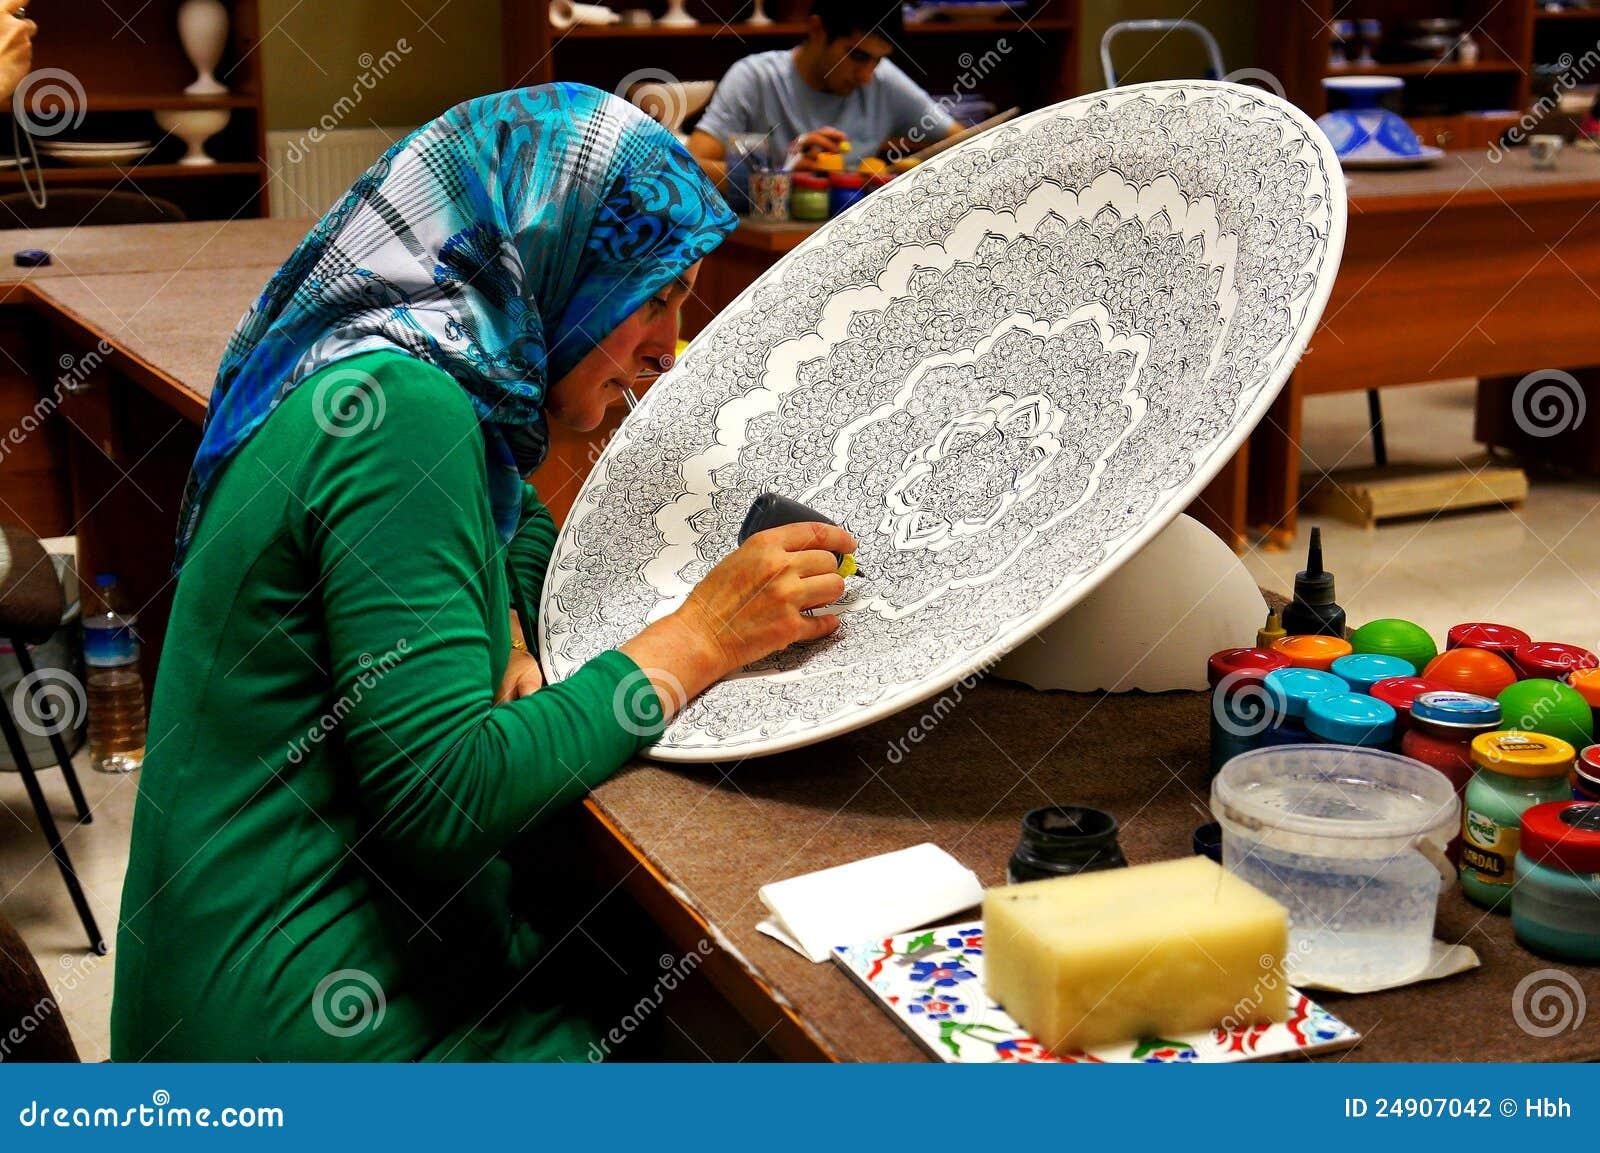 Turkey arts and crafts workshop editorial photography for Turkey country arts and crafts